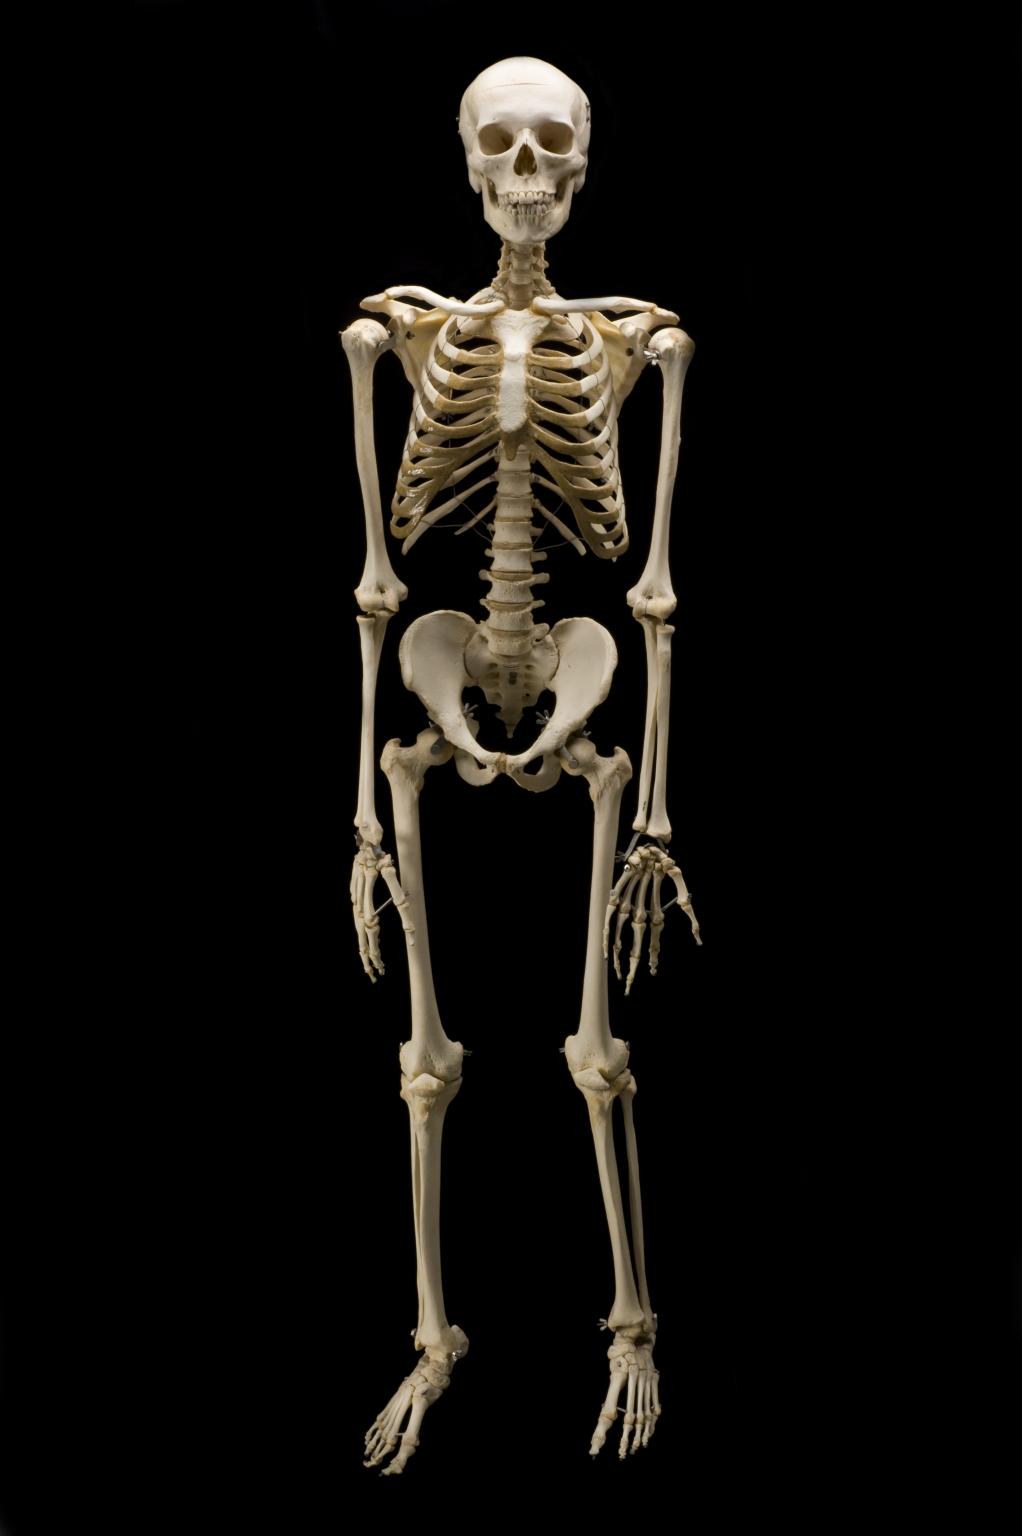 Image Skeletong Phobia Wiki Fandom Powered By Wikia